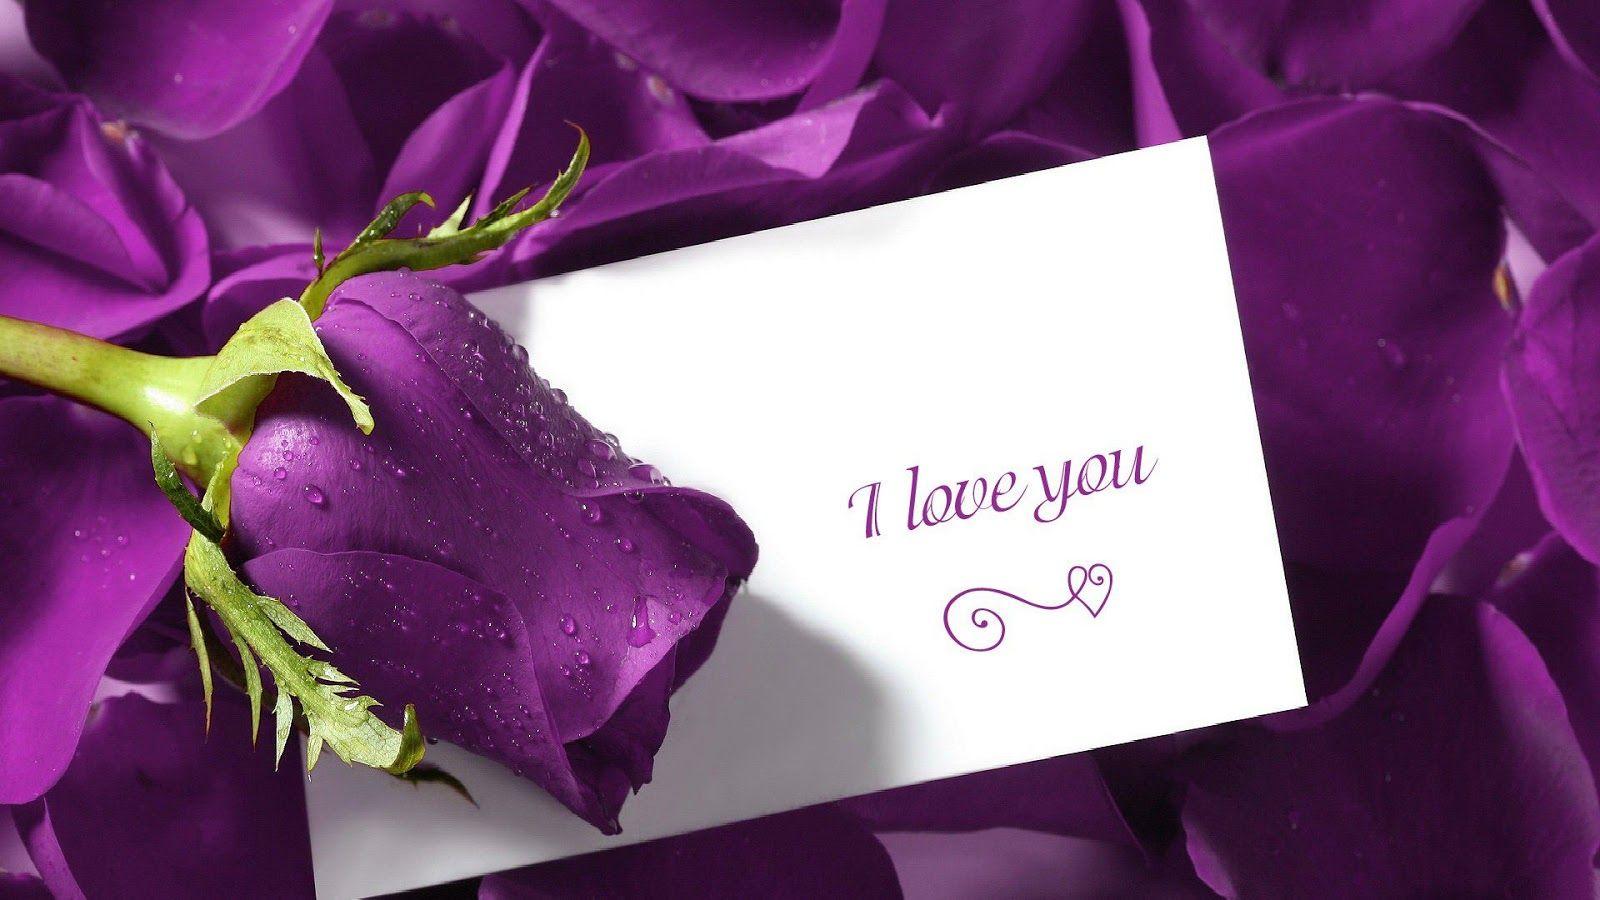 Must see Wallpaper Love Message - 31e1a87871b1ac35d09fd9cfc55da159  Pic_6911100.jpg